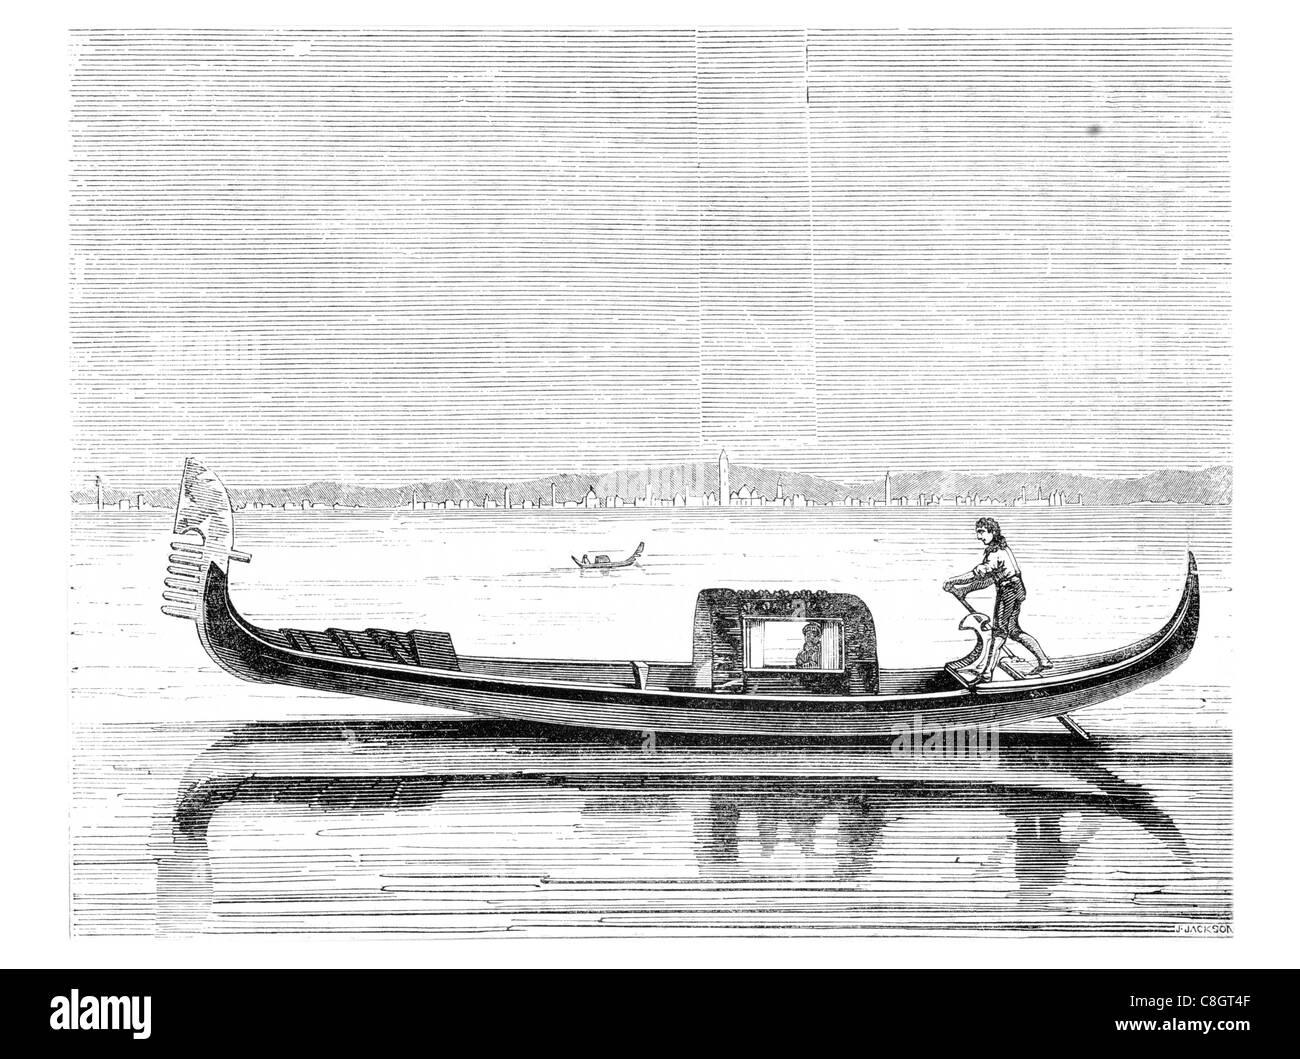 single rower gondola gondolas Venetian rowing boat public transport transportation watercraft ferry Grand Canal - Stock Image